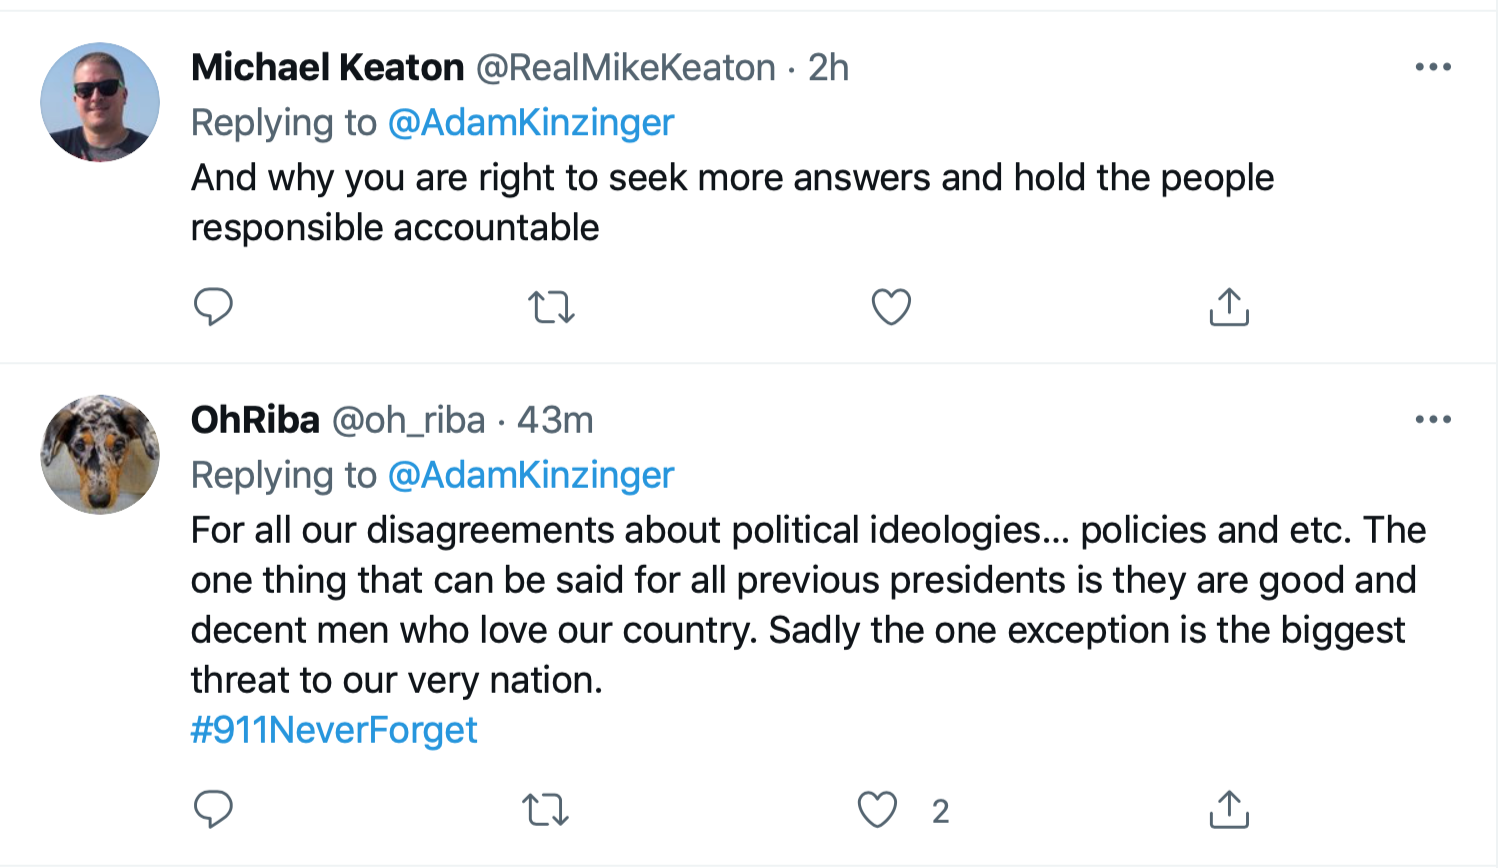 Screen-Shot-2021-09-11-at-1.48.07-PM Kinzinger Amplifies George Bush Comparison Of 9/11 To Insurrection Donald Trump Featured Investigation Politics Terrorism Twitter